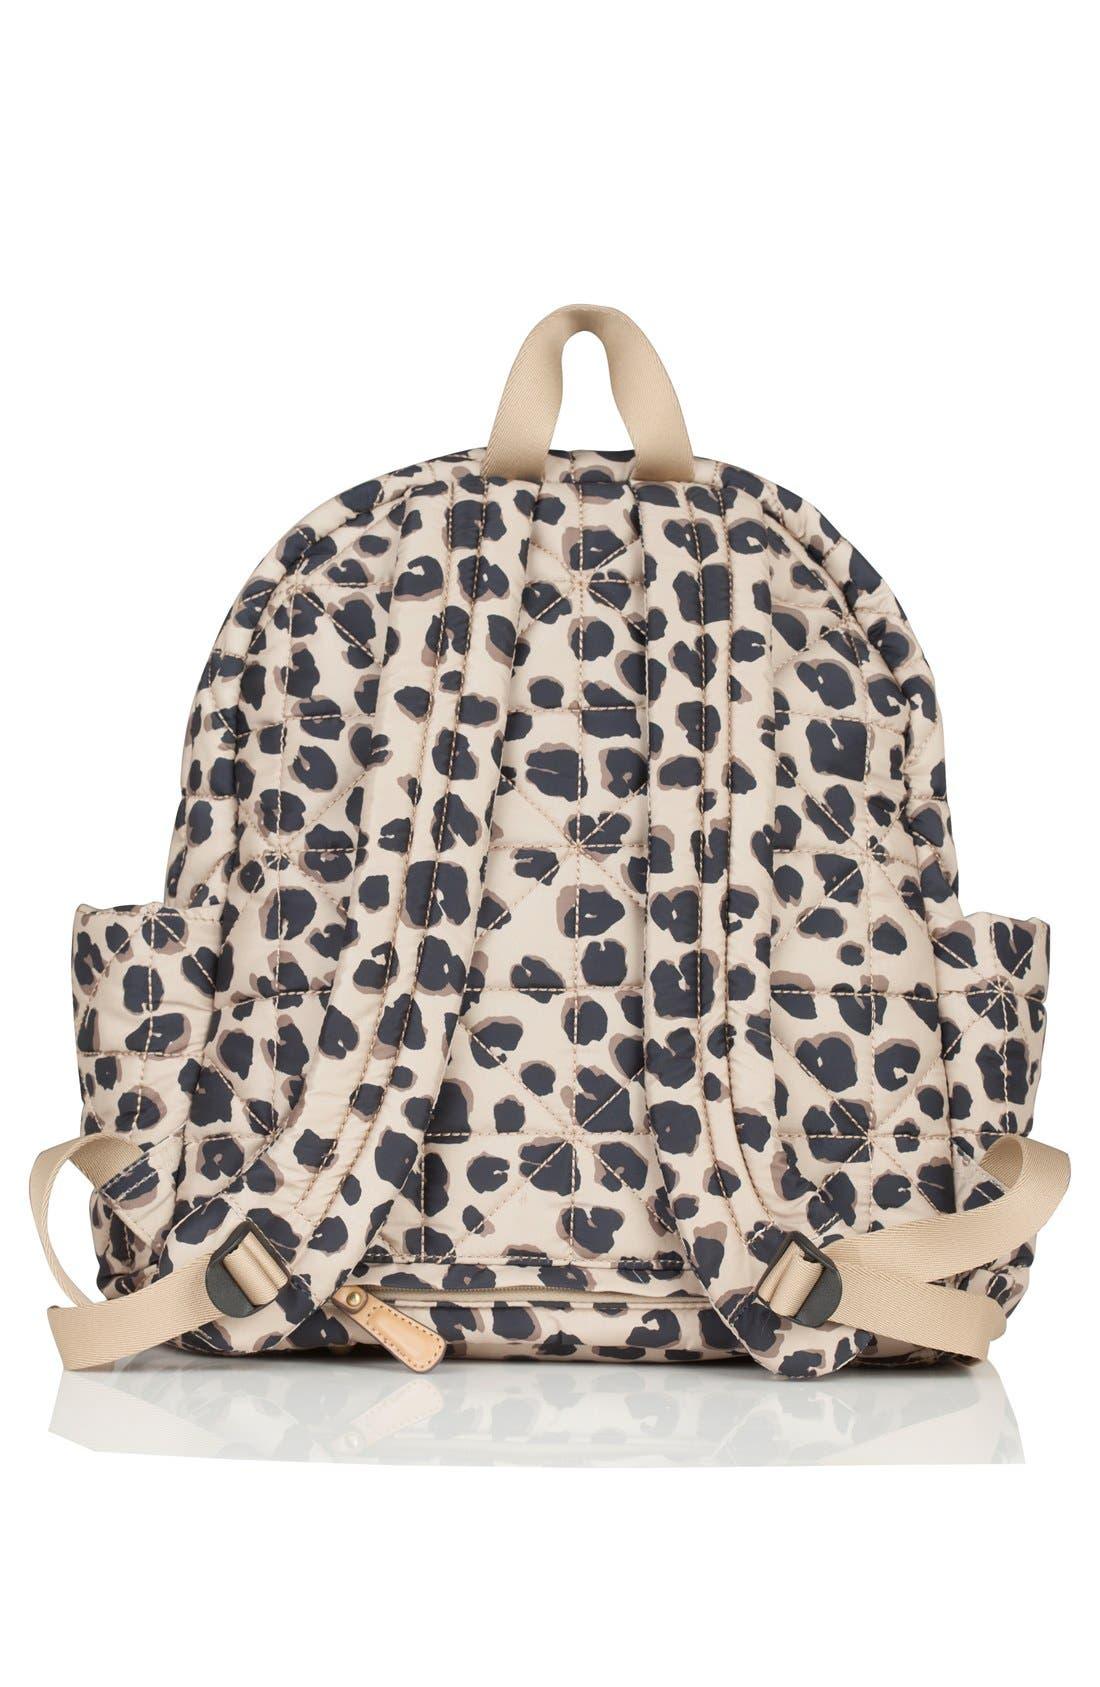 TWELVELITTLE, Quilted Water Resistant Nylon Diaper Backpack, Alternate thumbnail 6, color, LEOPARD PRINT